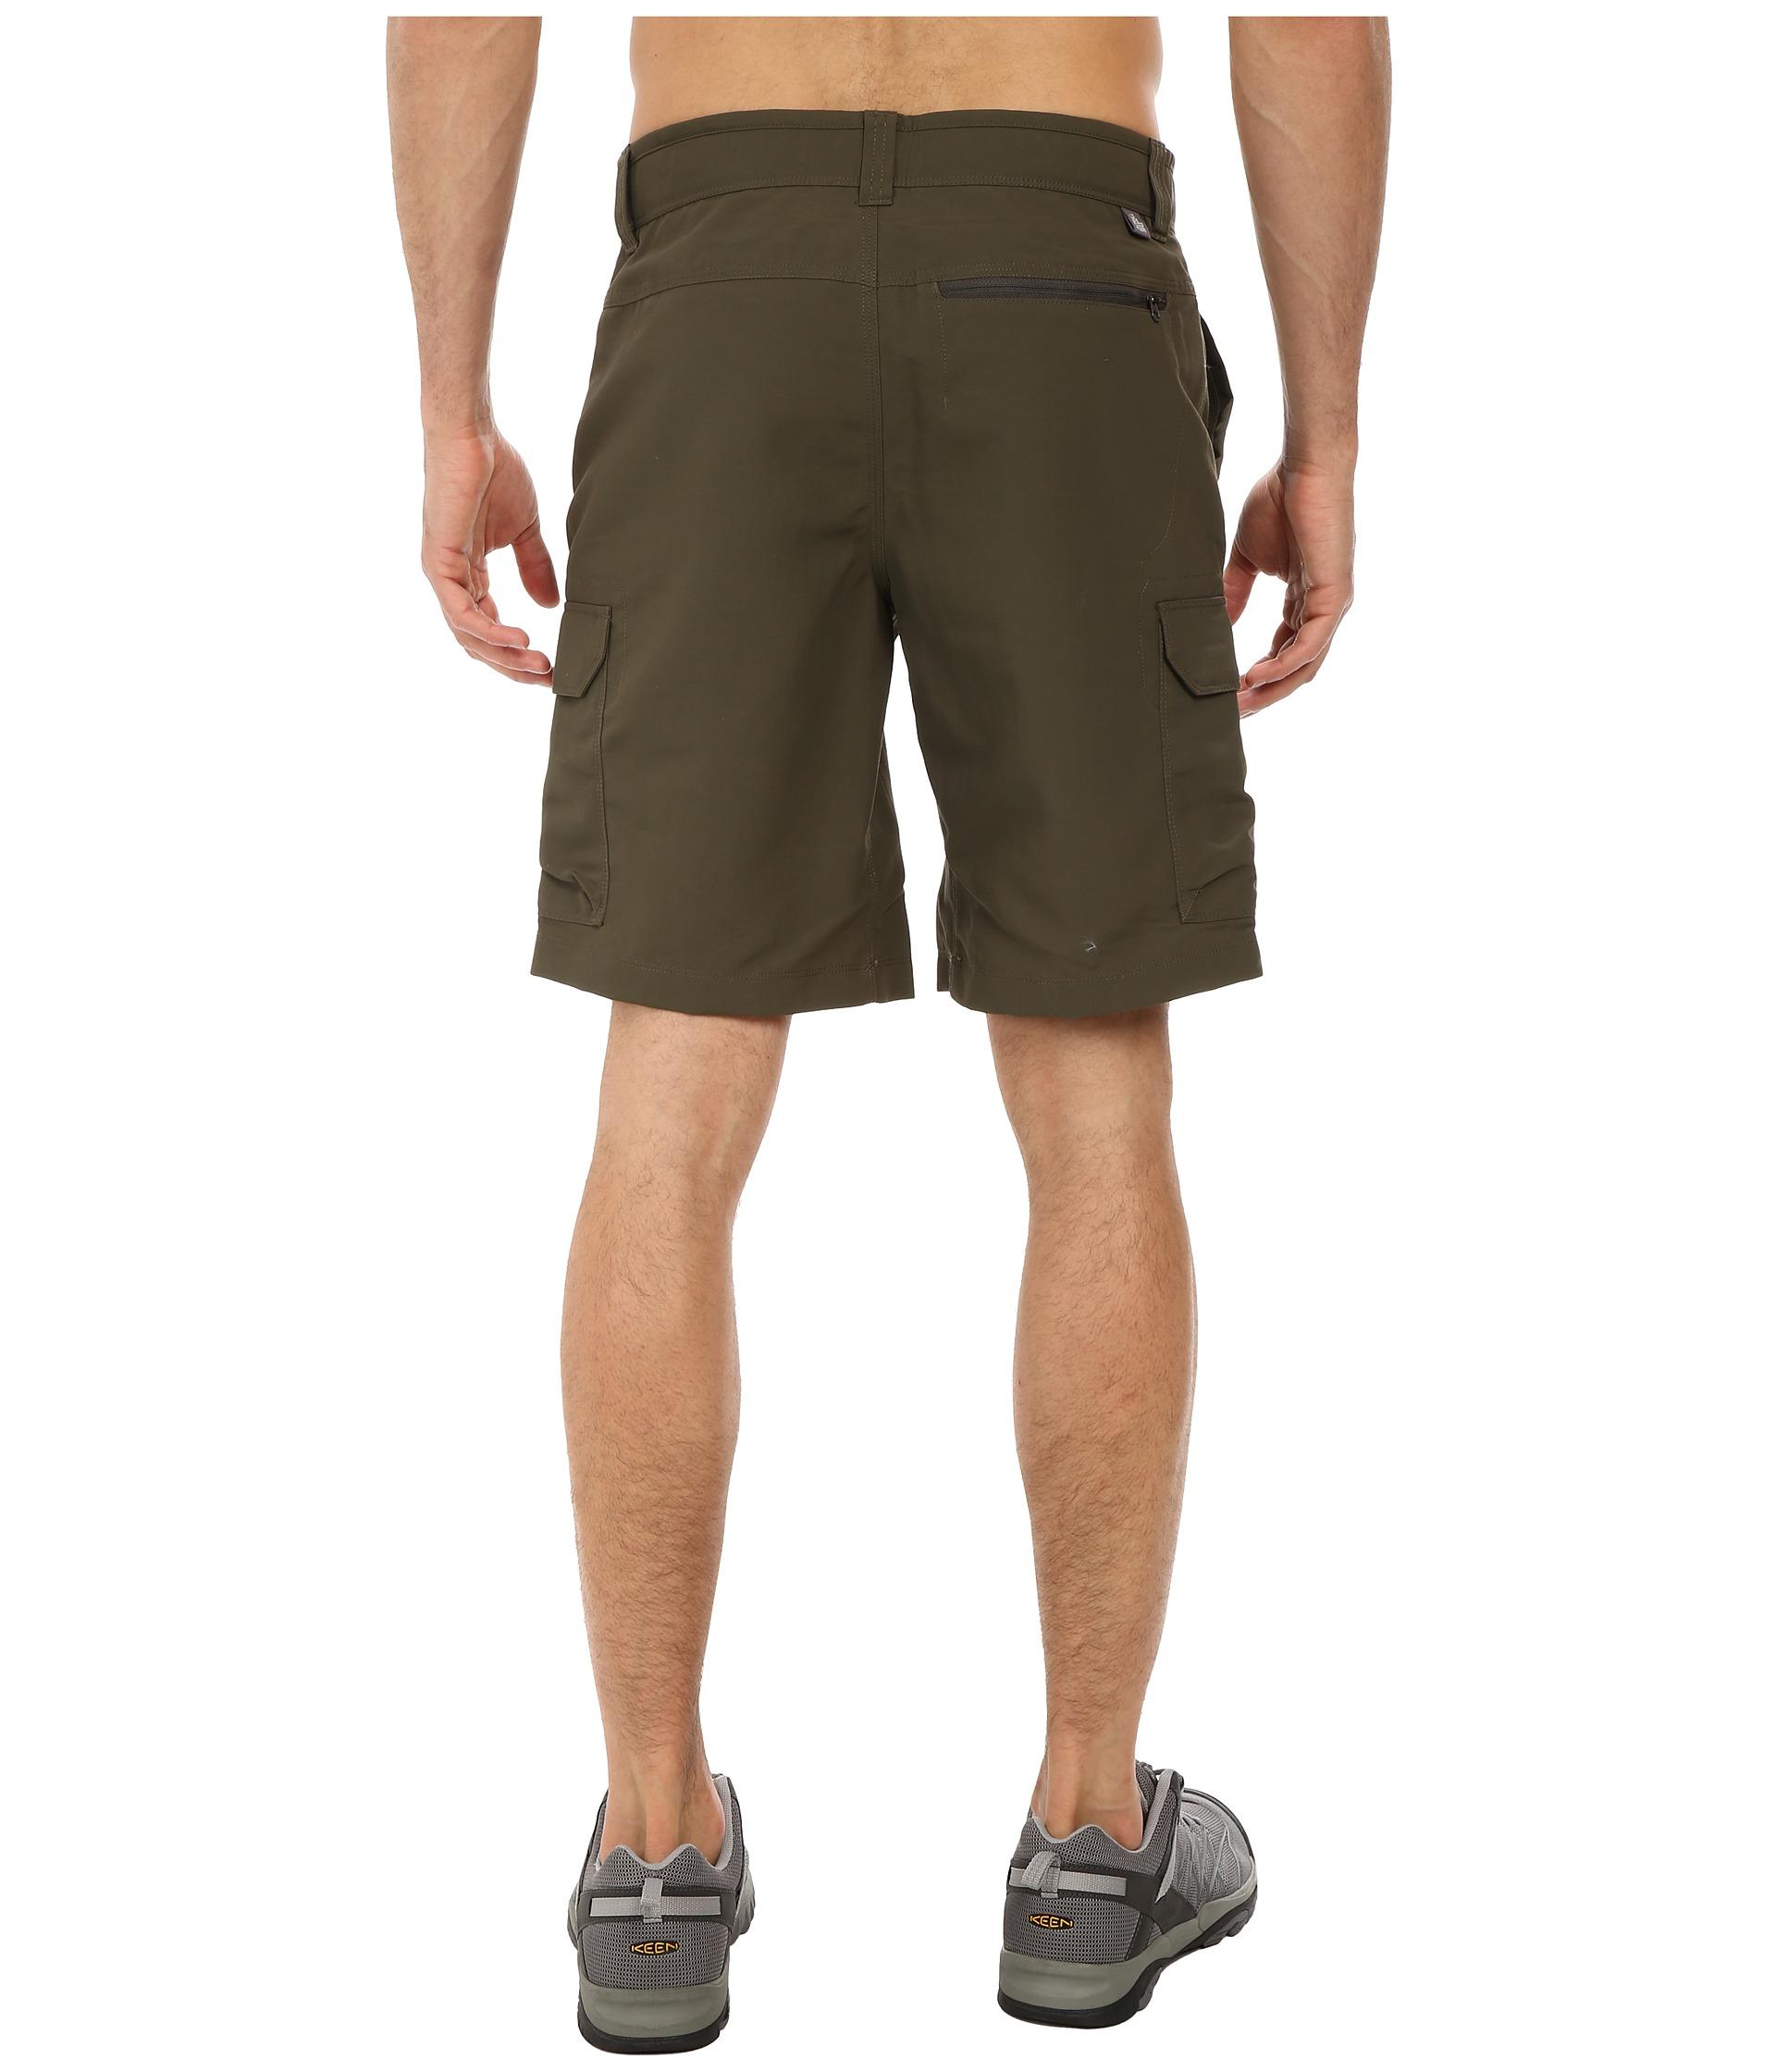 c57df63a1e mens north face cargo shorts - Marwood VeneerMarwood Veneer